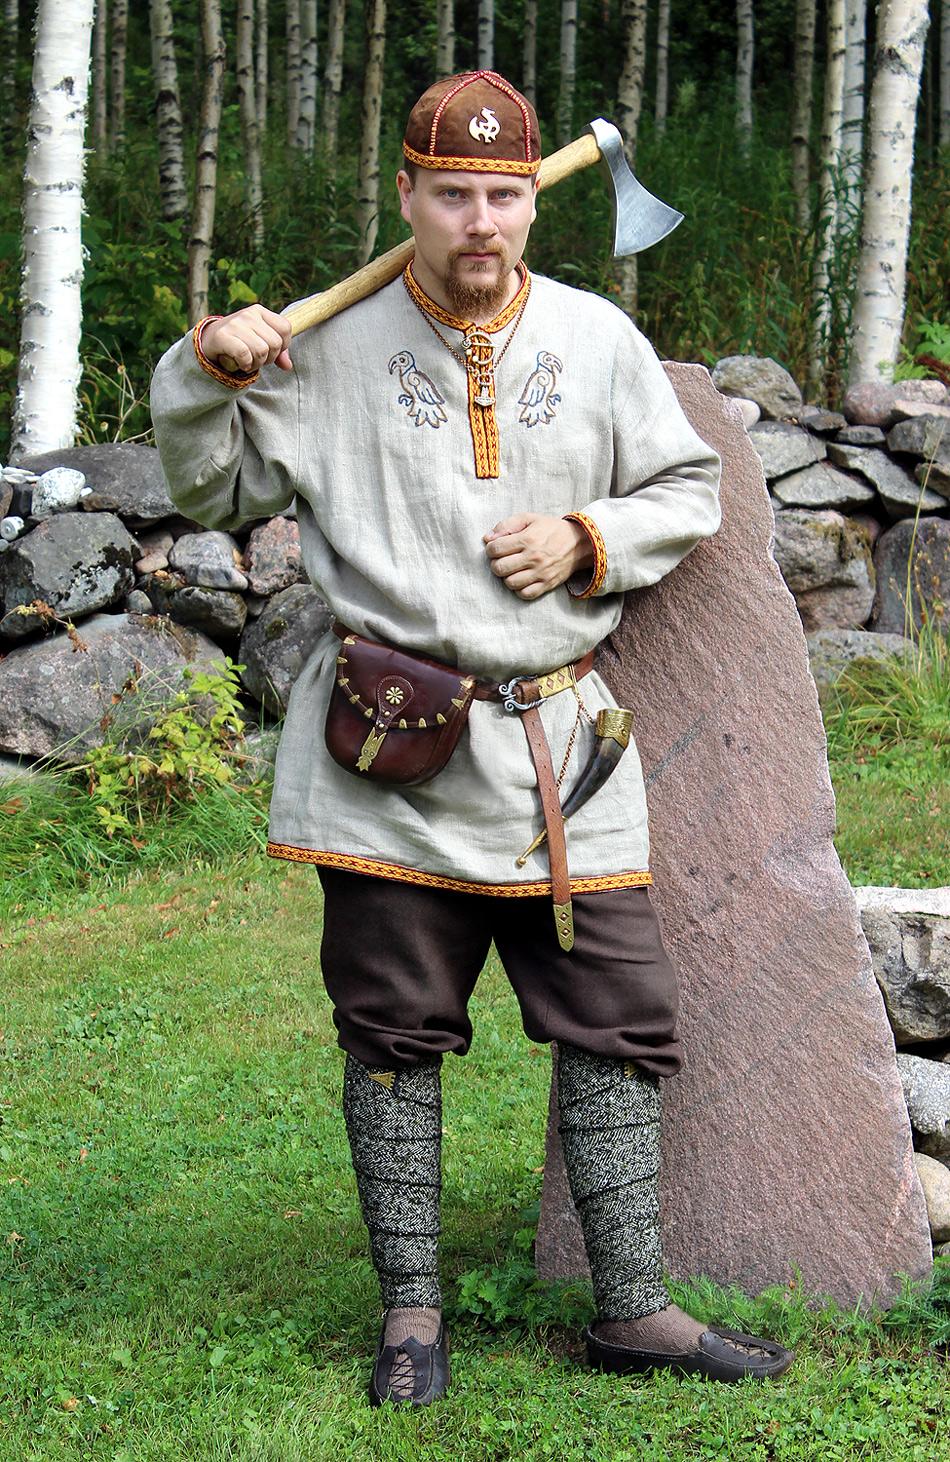 Viking costume 2 by Astalo on DeviantArt